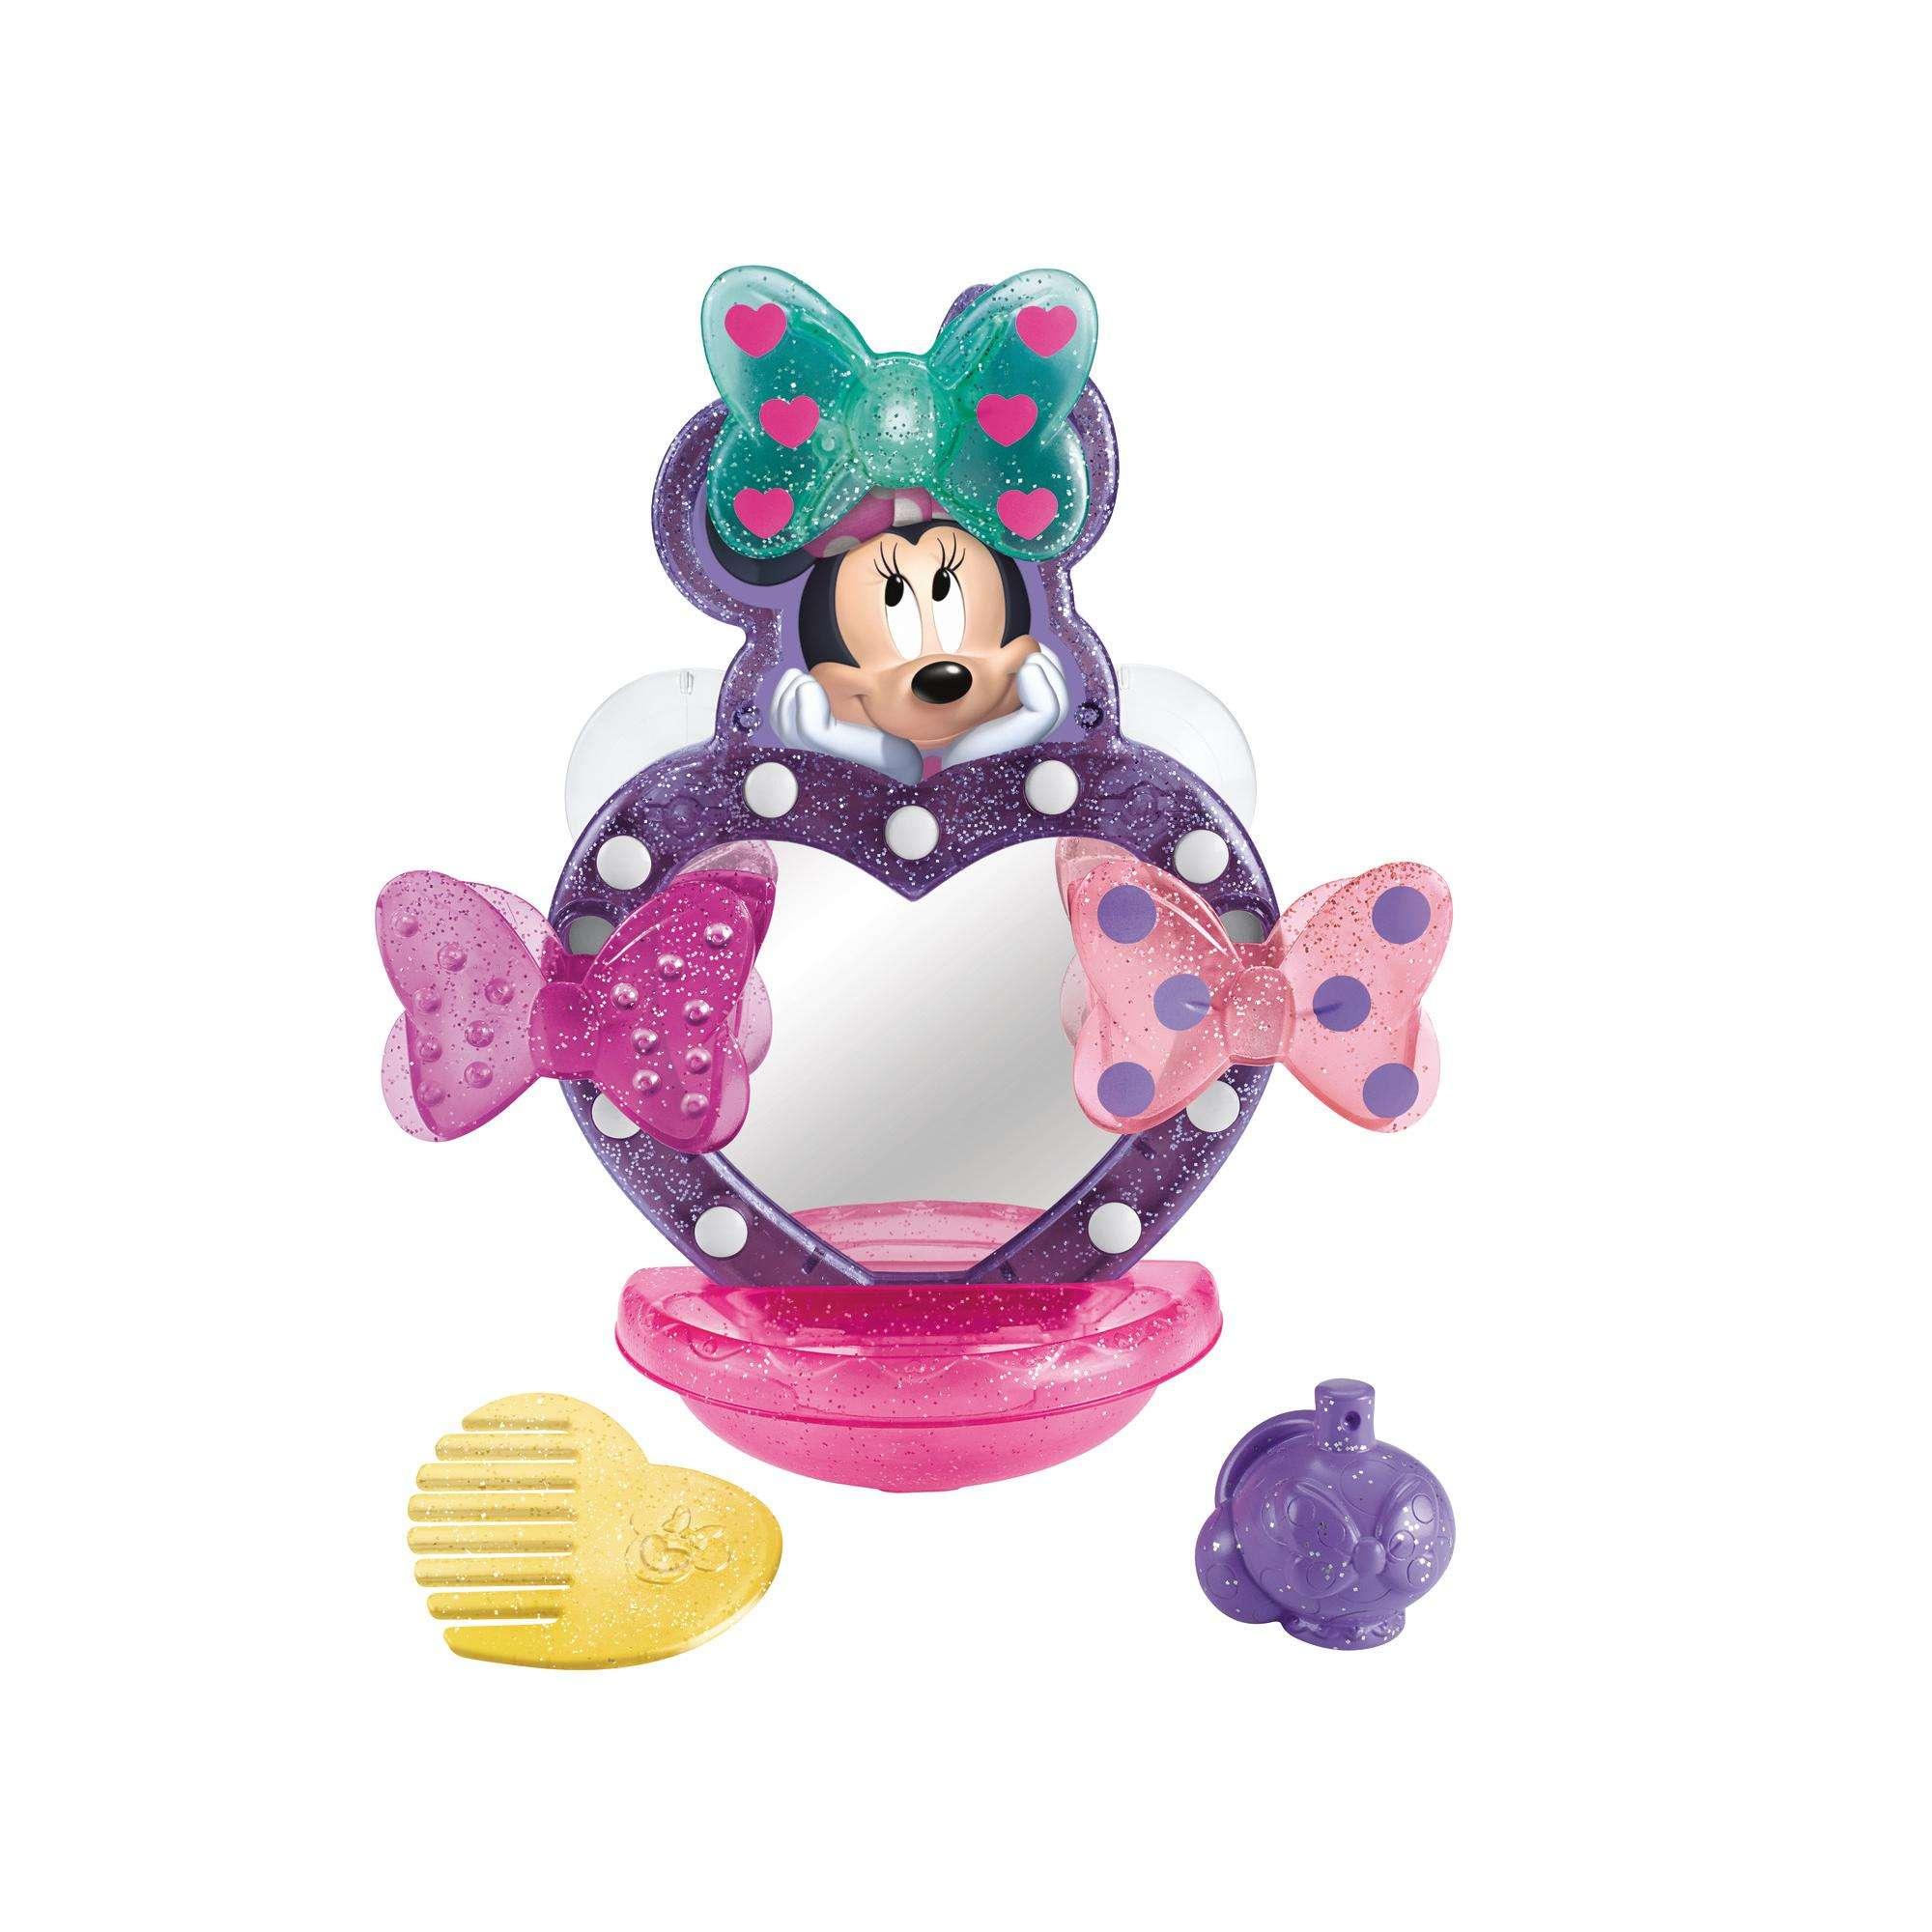 Disney Minnie Mouse Bow Rific Bath Vanity